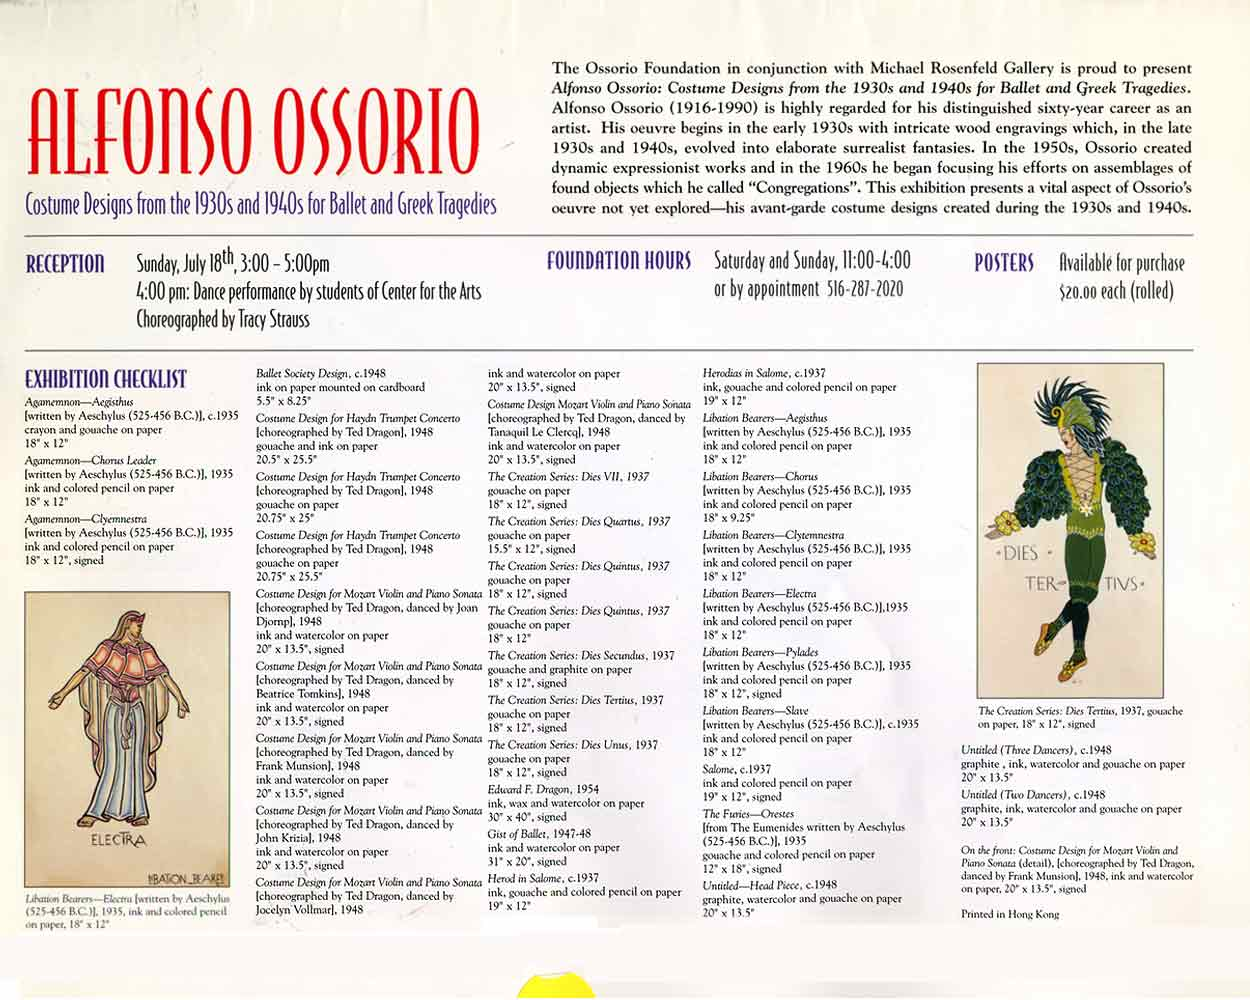 Alfonso Ossorio: Costume Designs, flyer, pg 1